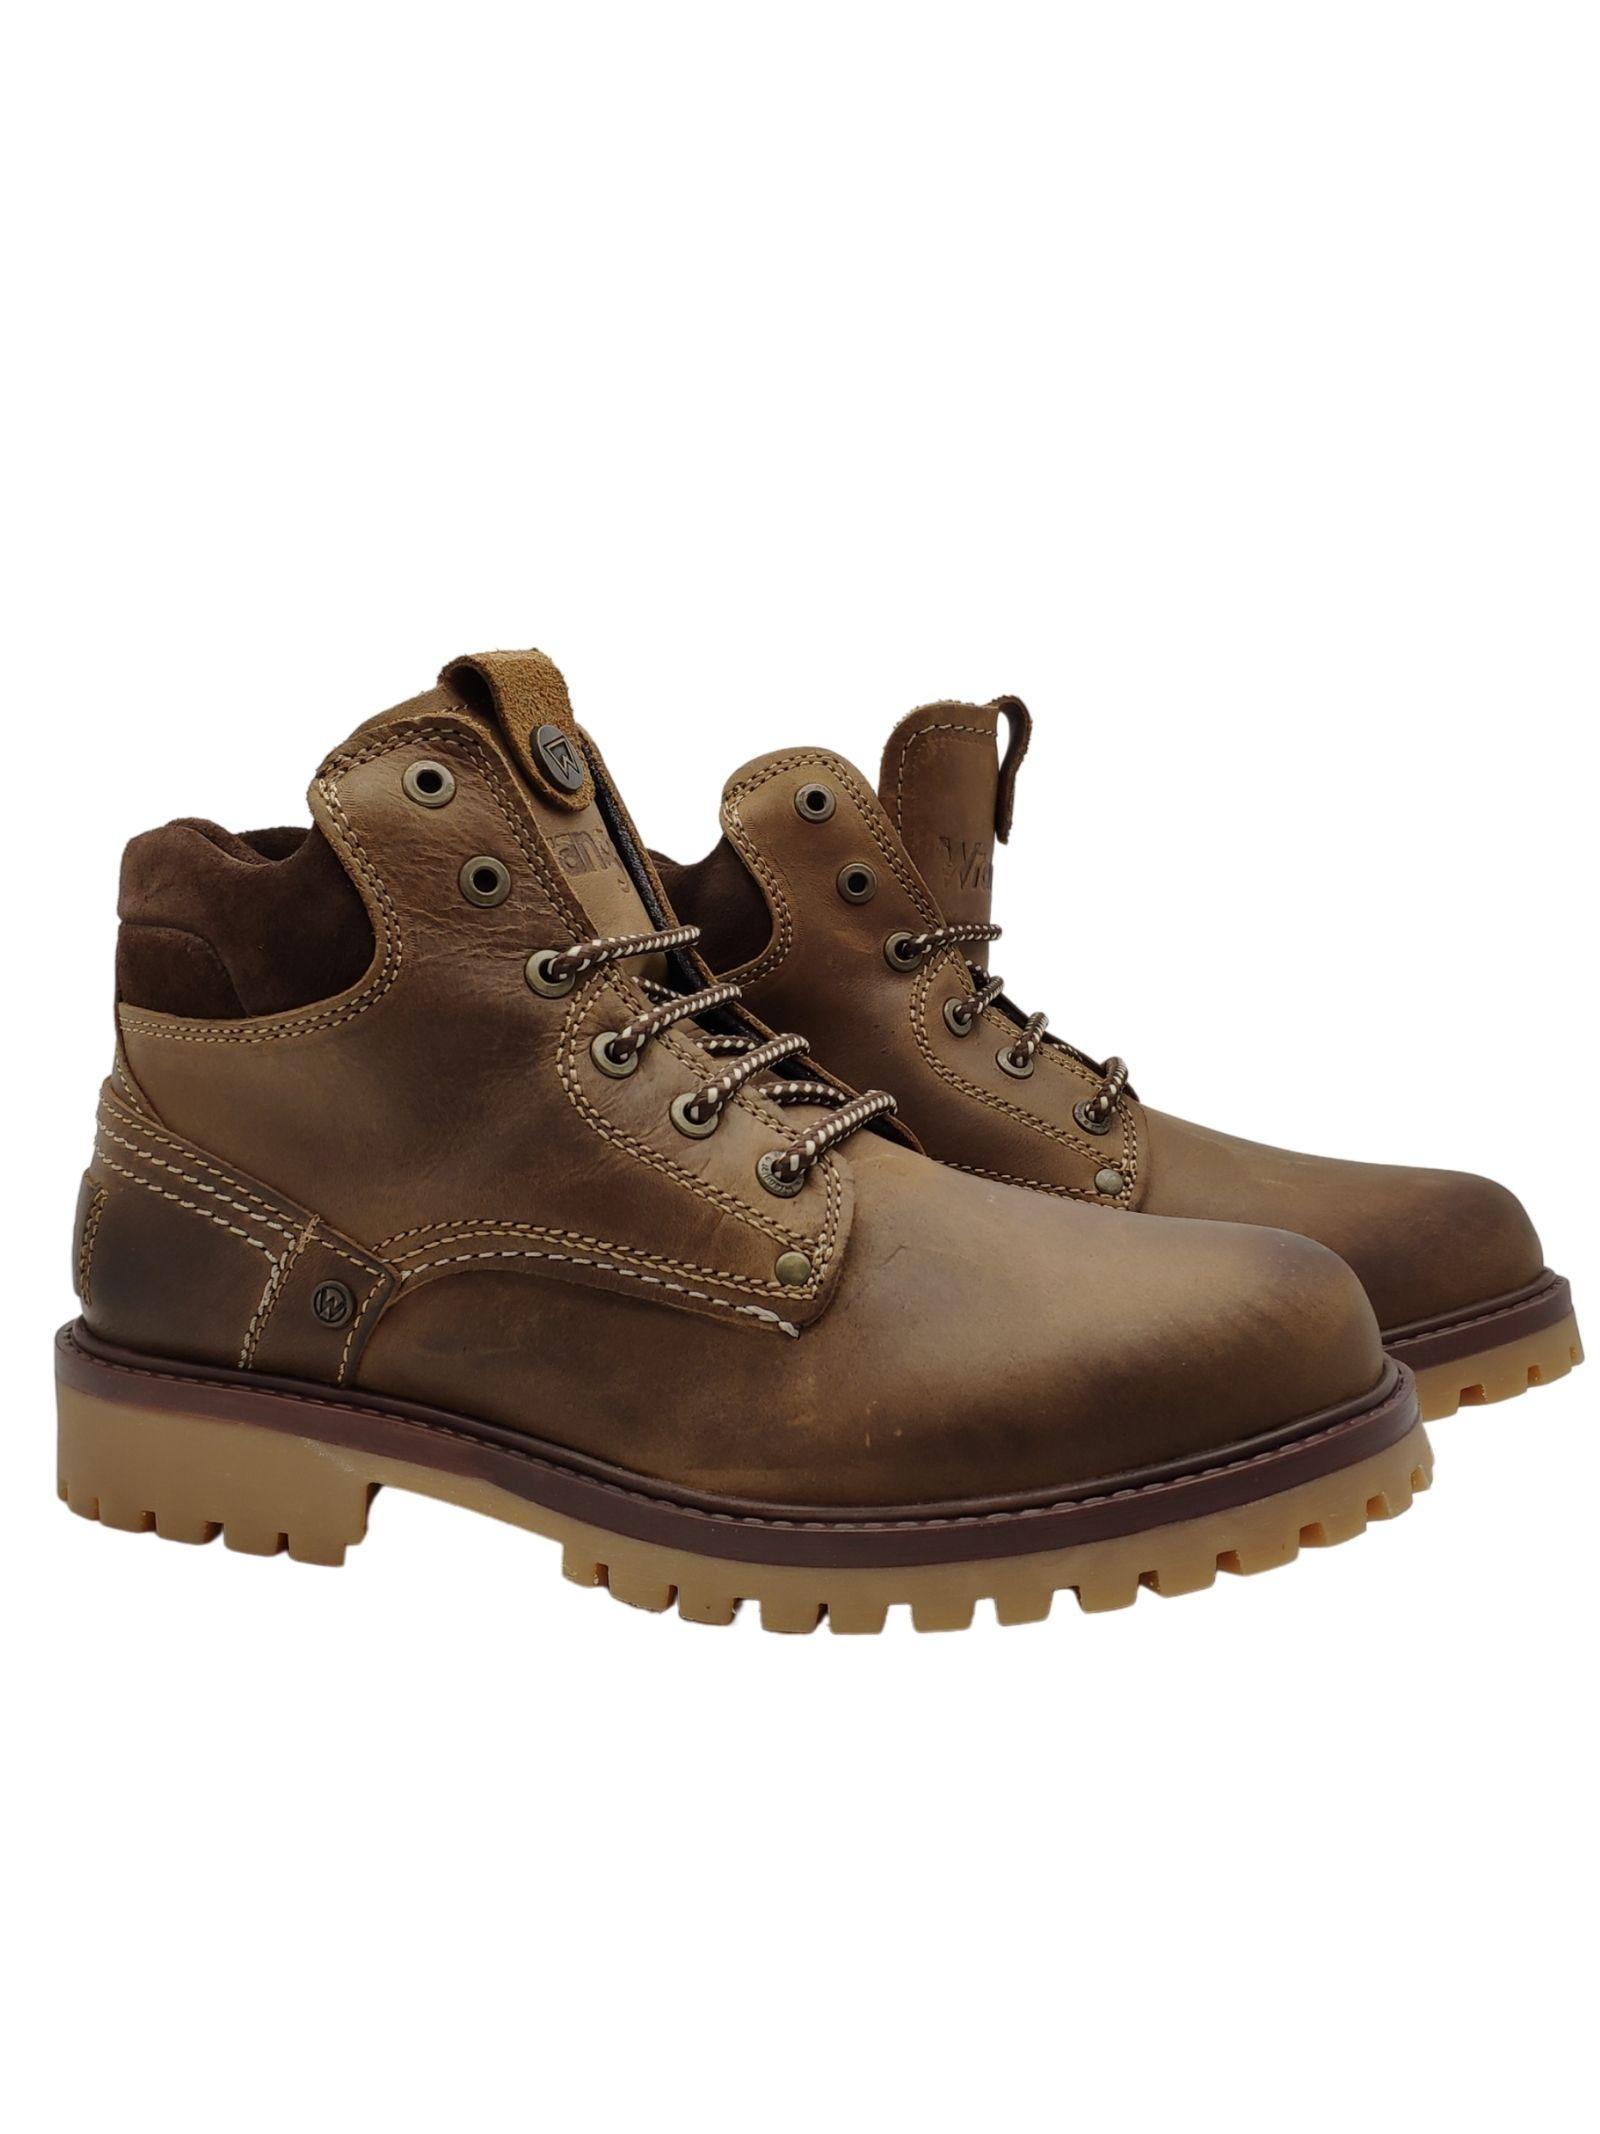 Yuma Man Trekking Boots Wrangler   Ankle Boots   WM02140A029